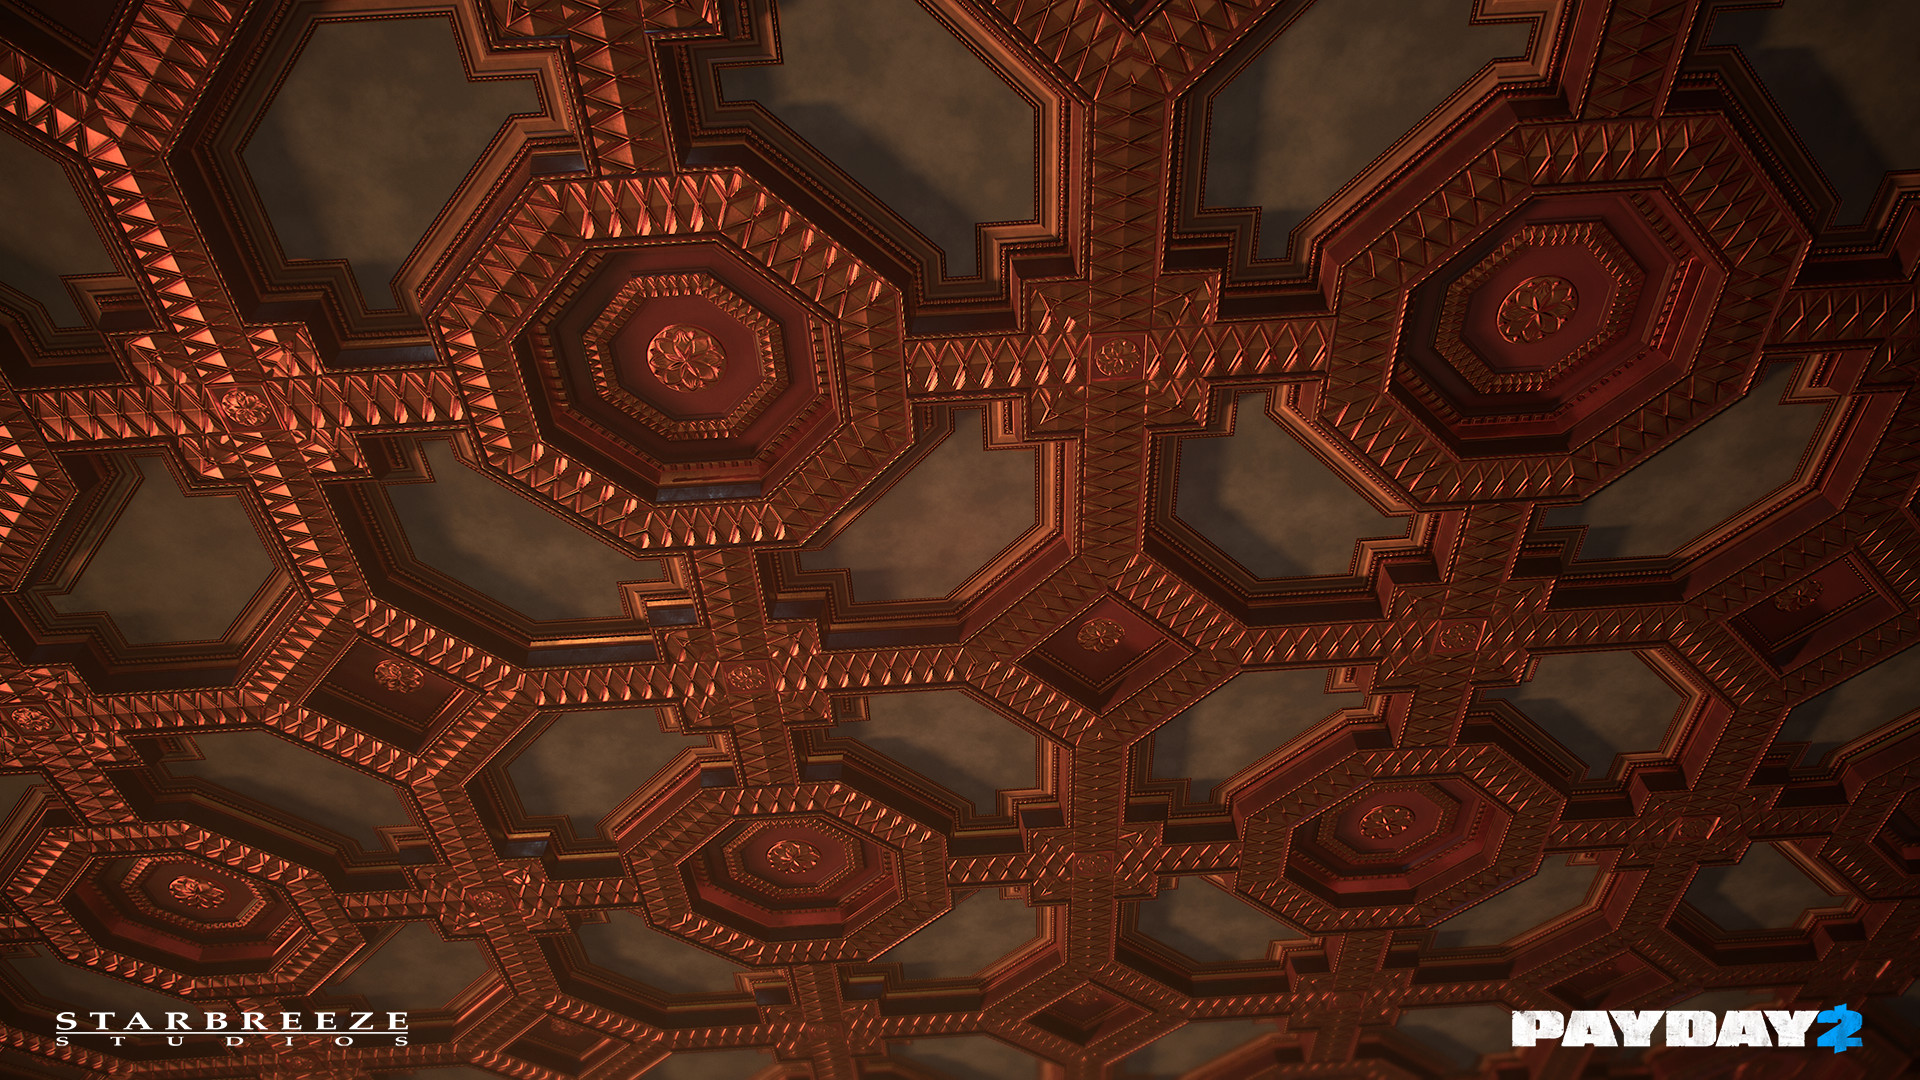 Lucas josefsson lucasjosefssonpayday2 ceiling 1